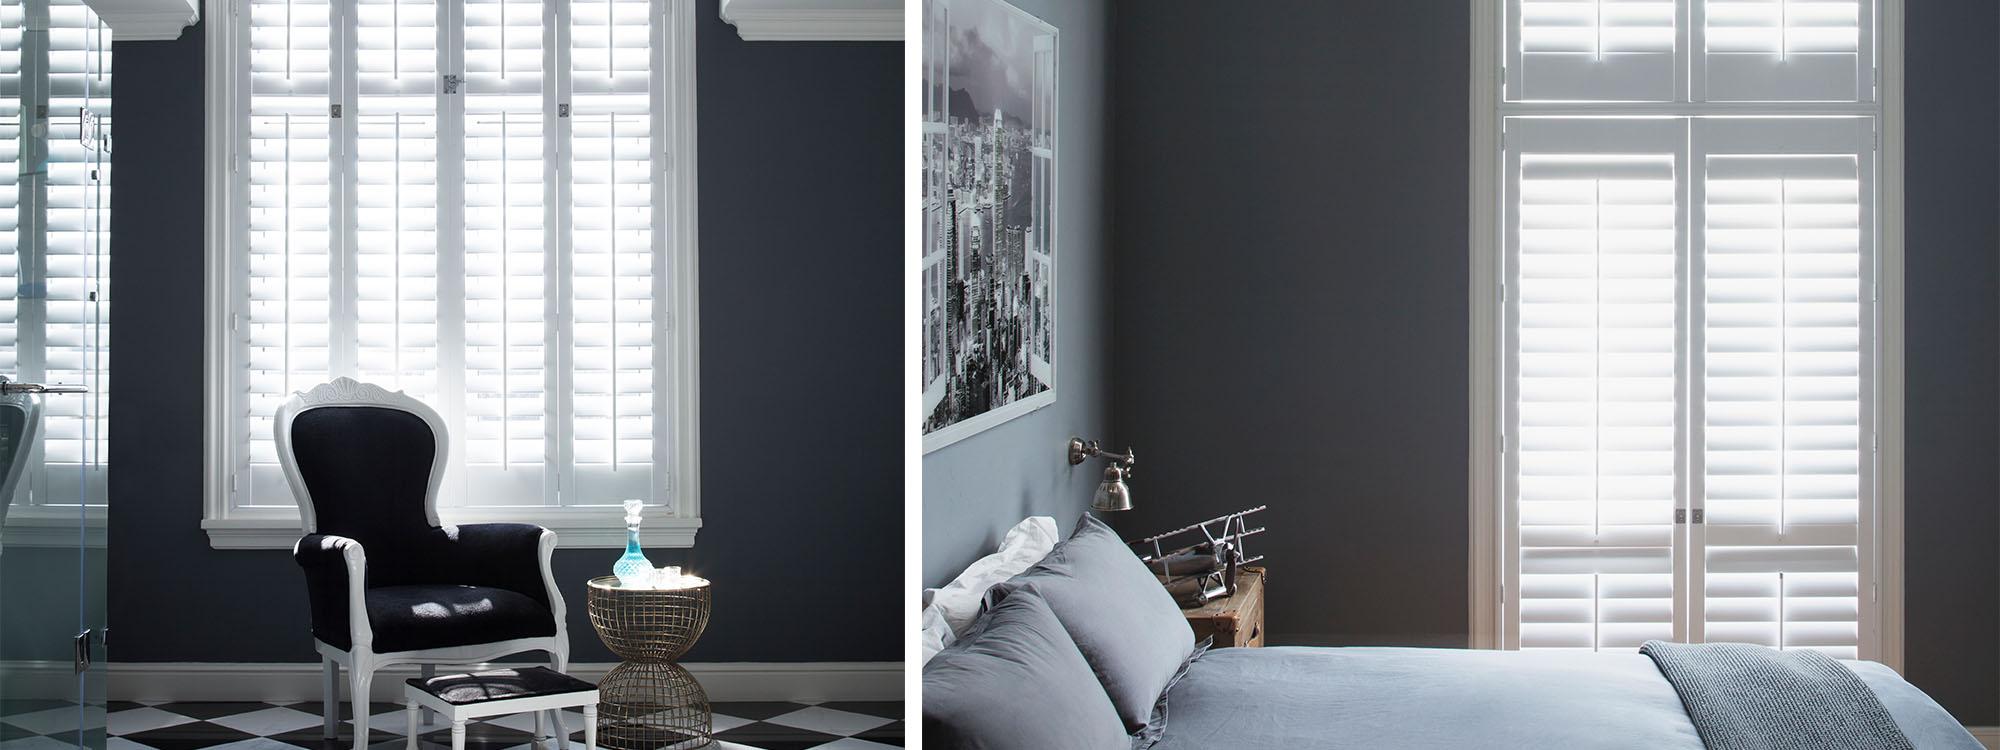 Decowood-shutters-bedroom-tile